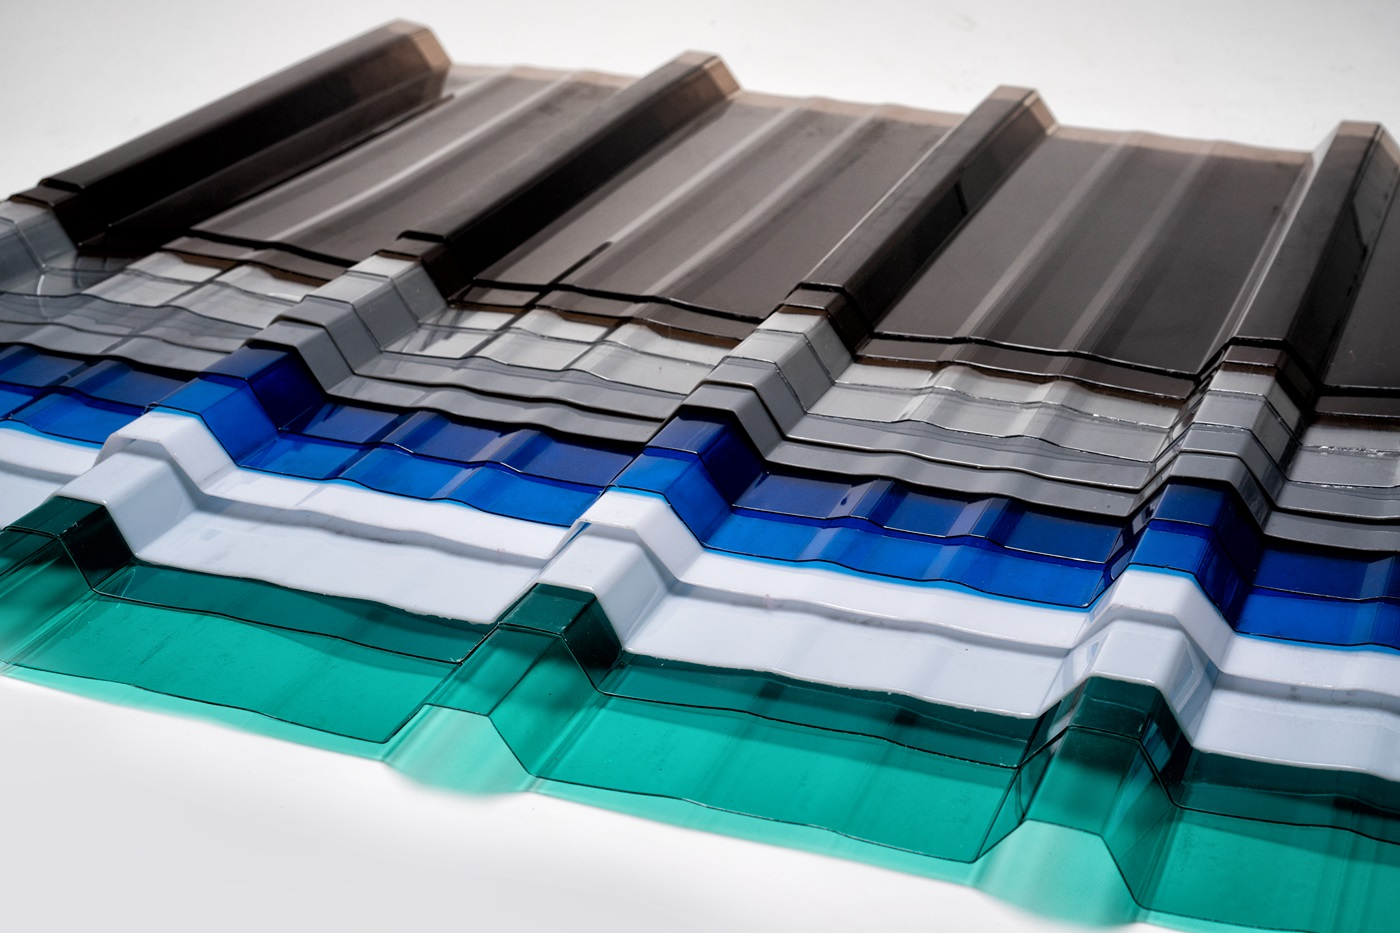 Polycarbonate sheet, corrugated sheet, patio, sunshade, roofing